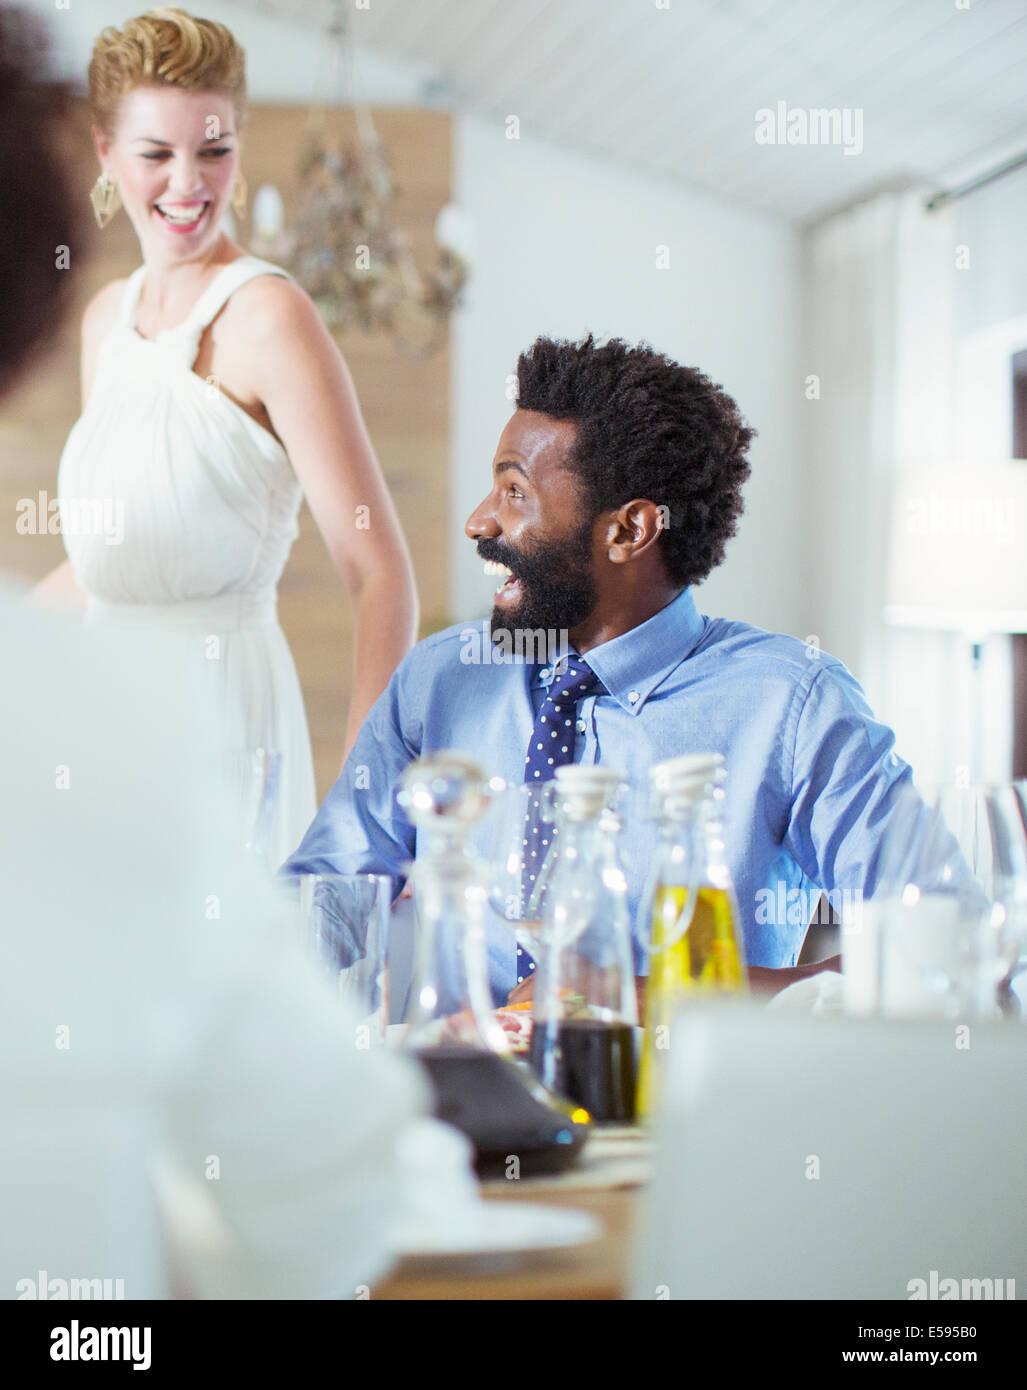 Hombre reírse de la cena Imagen De Stock